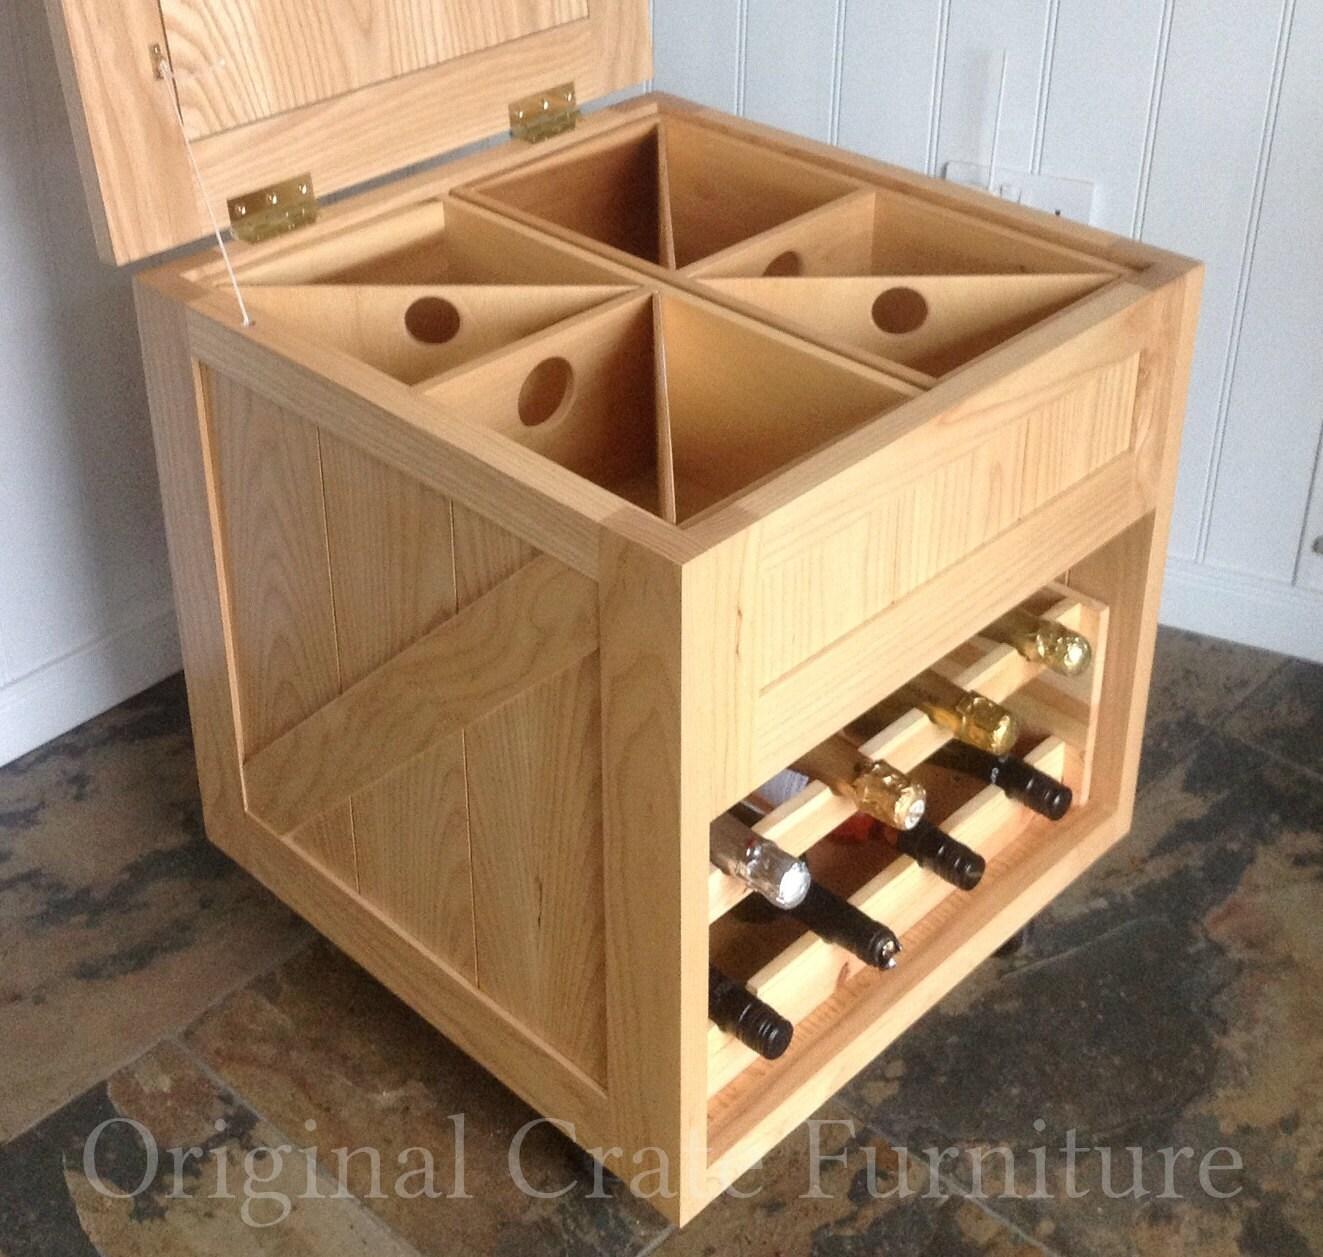 The wine crate a unique wine rack conversation furniture for Wine crate furniture